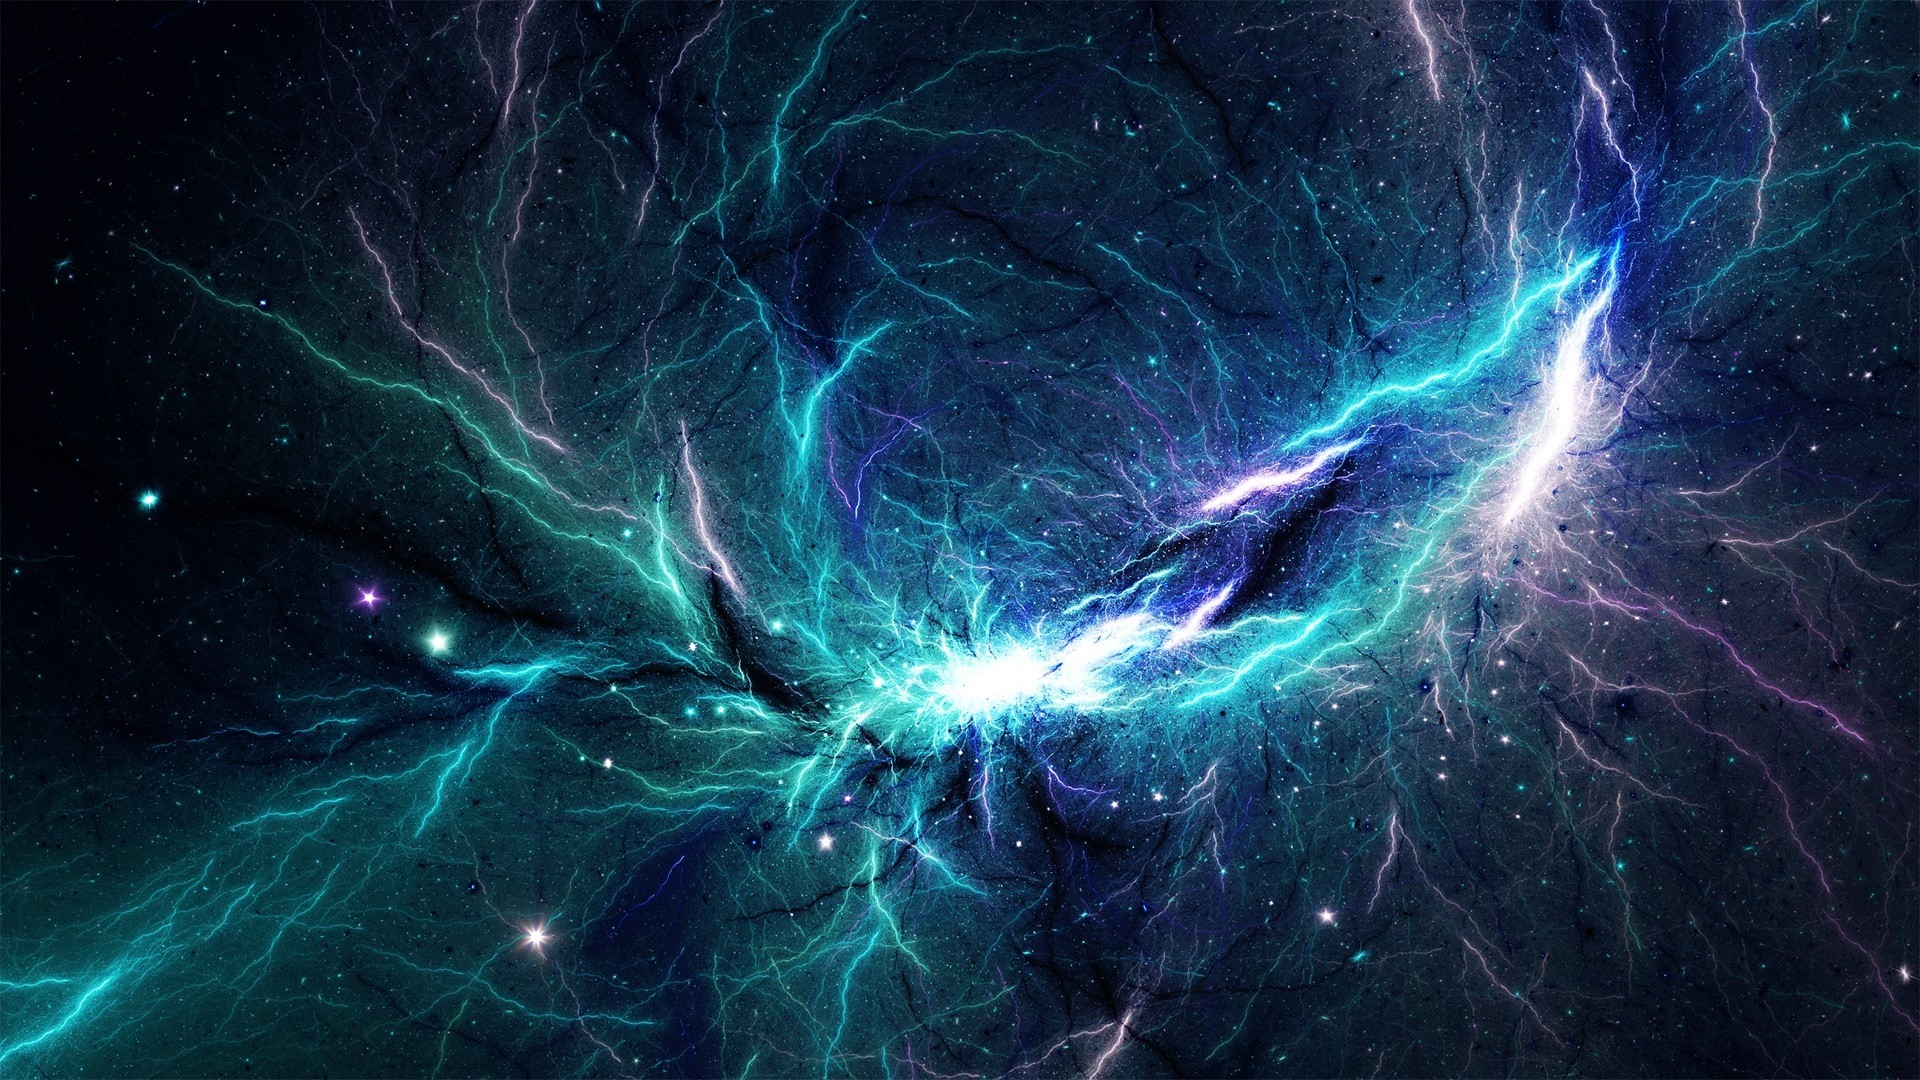 Abstract Space hd desktop wallpaper